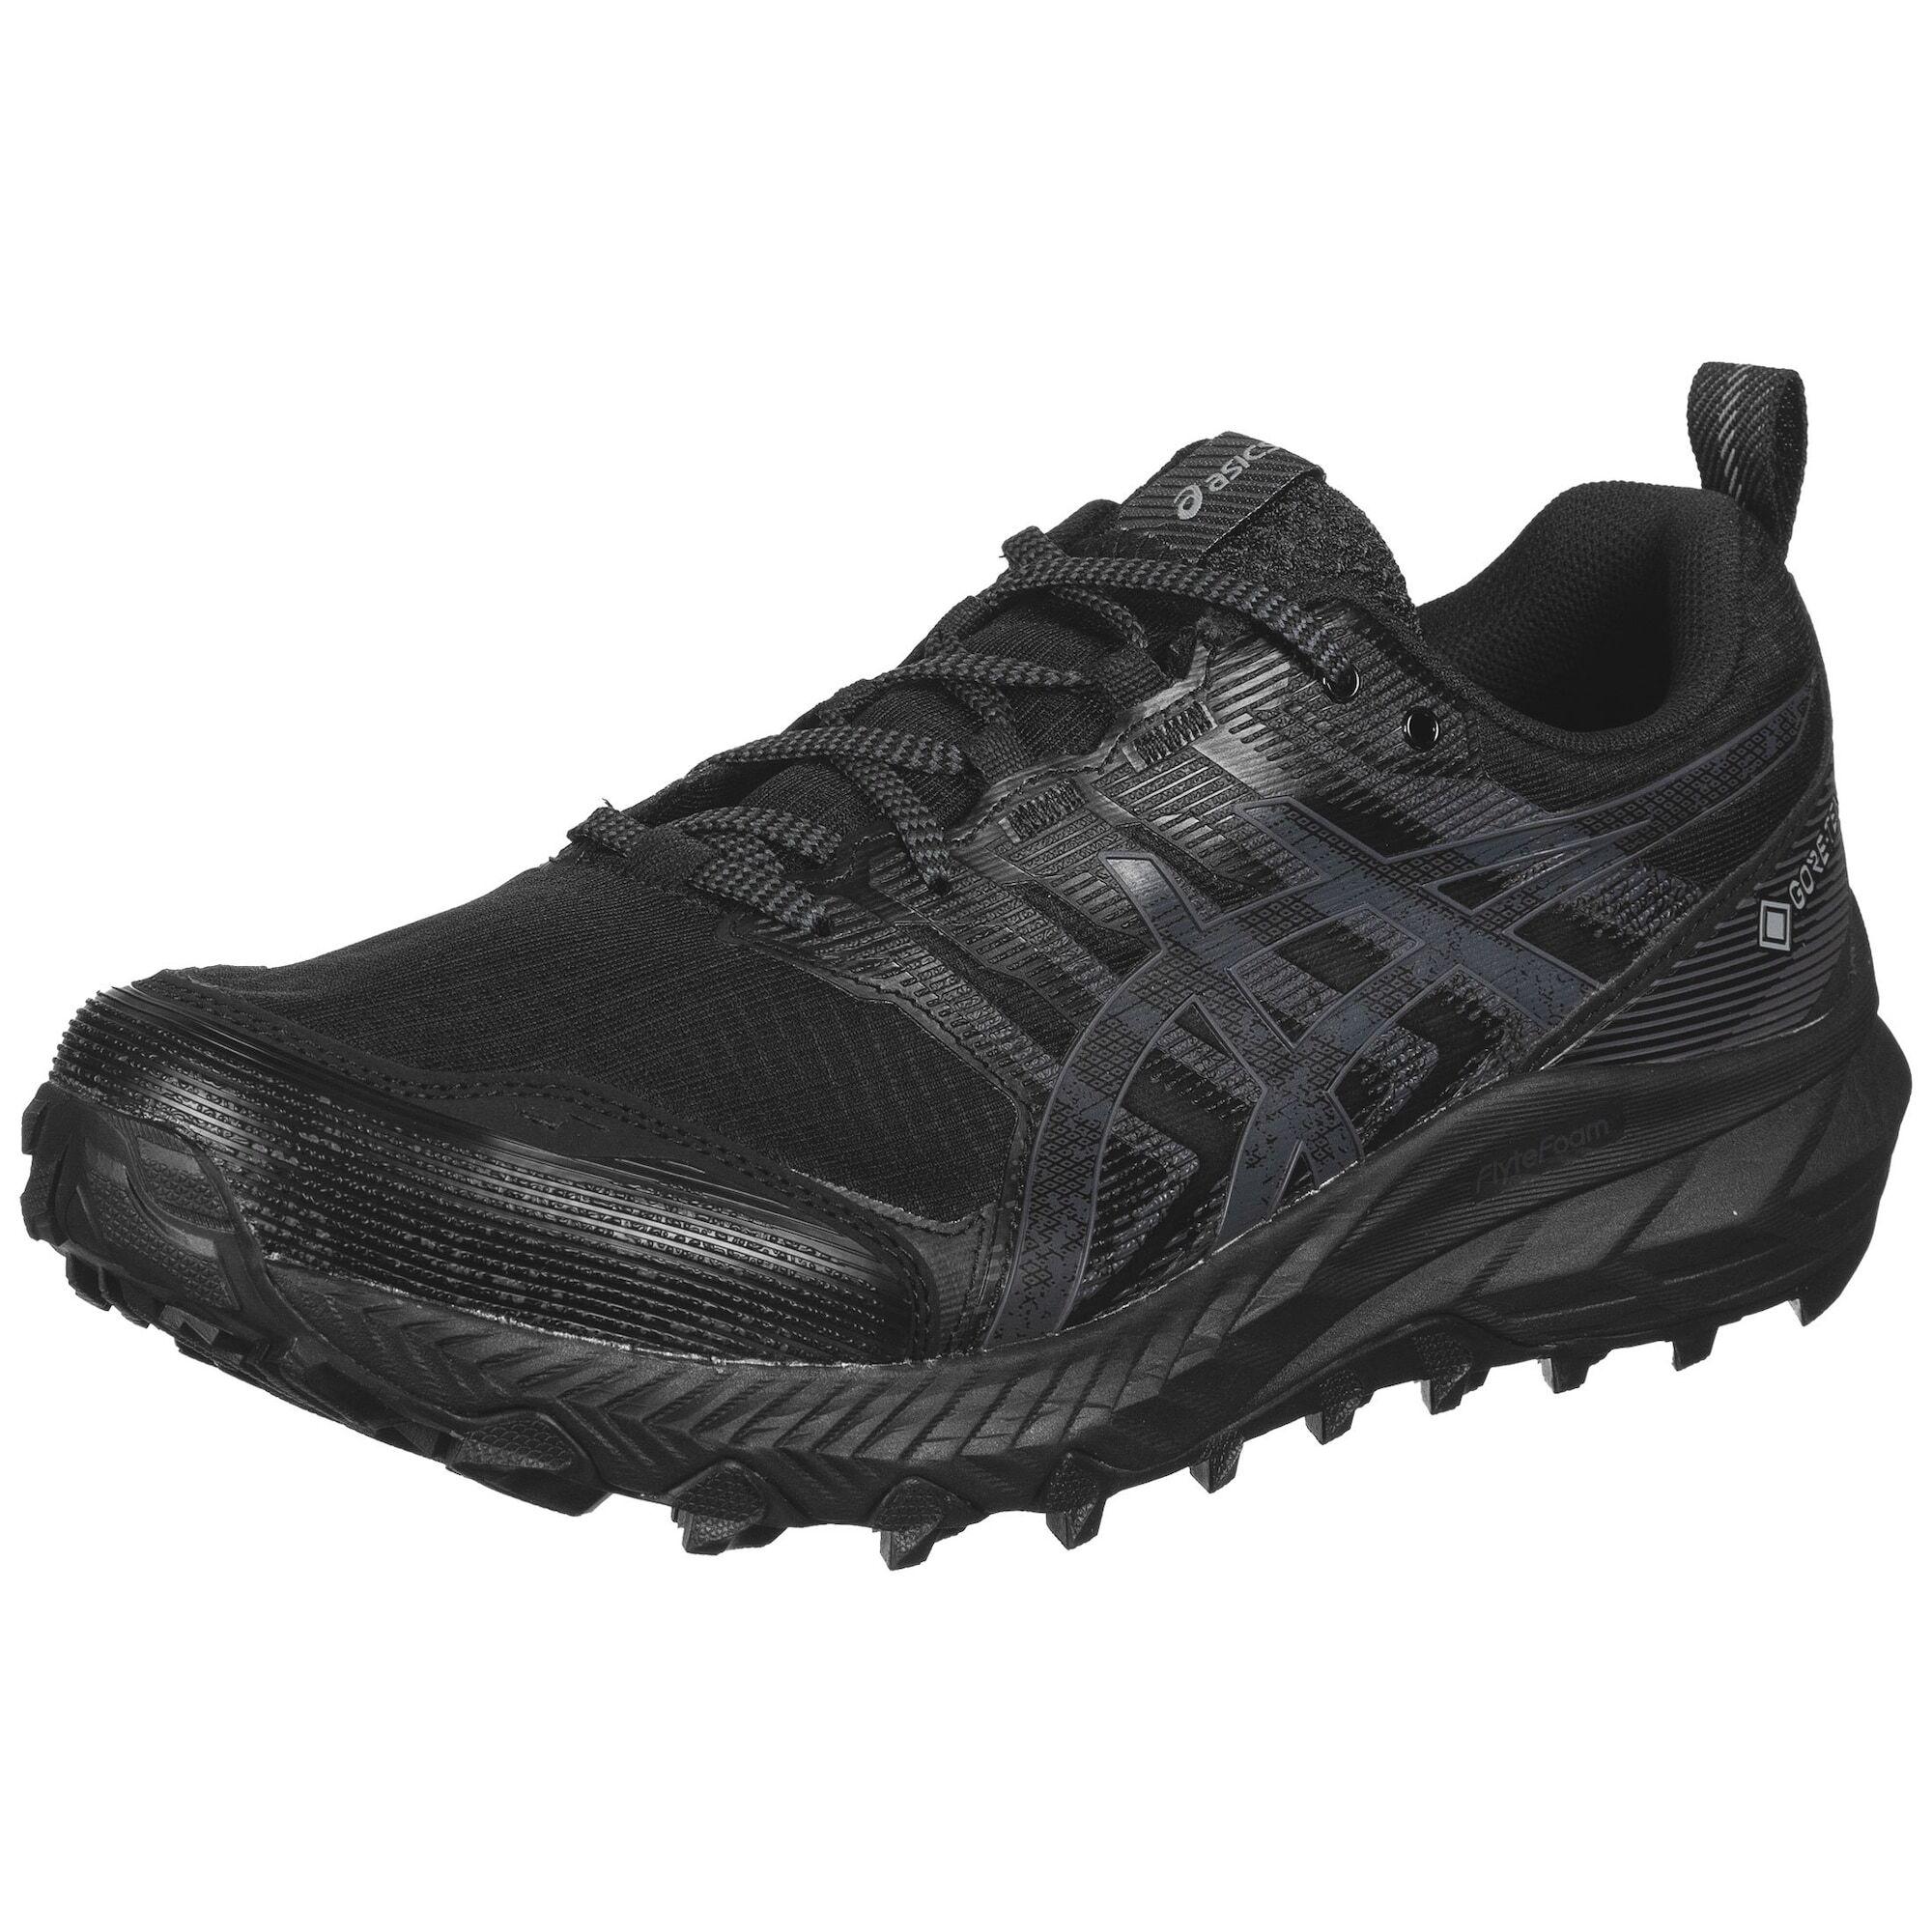 Asics Chaussure de course ' Fujitrabuco 09 G-TX '  - Noir - Taille: 46.5 - male